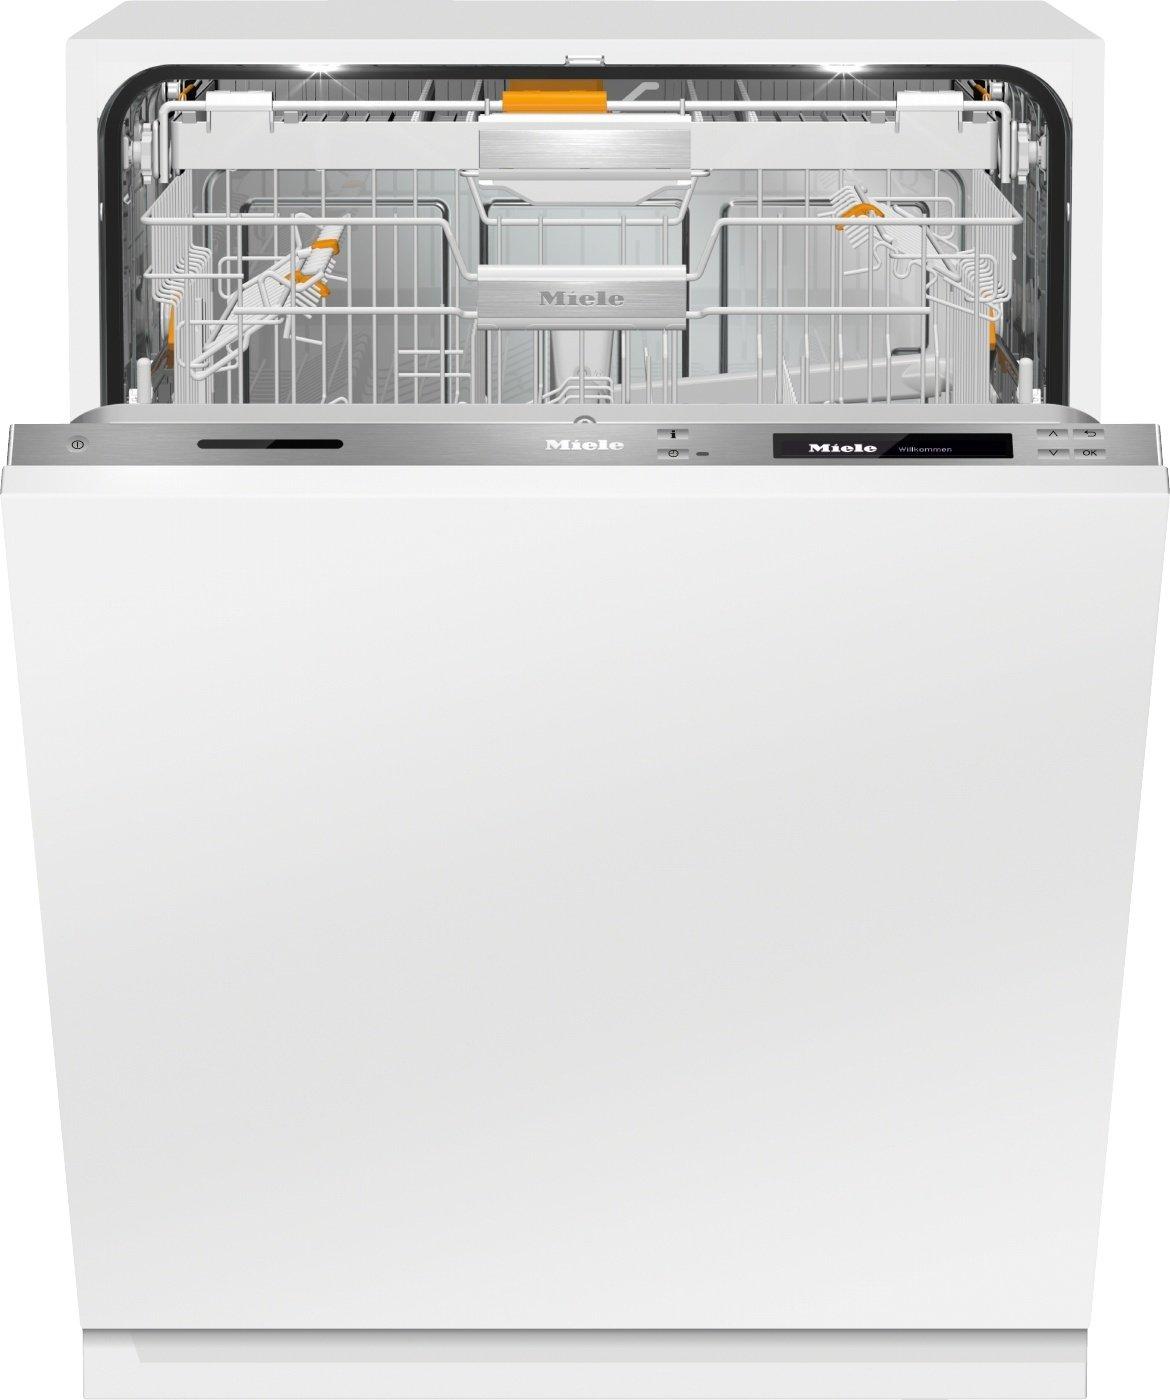 Miele G6997 SCVi XXL D ED230 2, 0 k2o Geschirrspüler Vollintegriert / A+++ / 189 kWh / 14 MGD / Automatische Türöffnung bei 2maligem Klopfen Knock2open / Einfachste Kommunikation [Energieklasse A+++] G6997 SCVi XXL D ED230 2